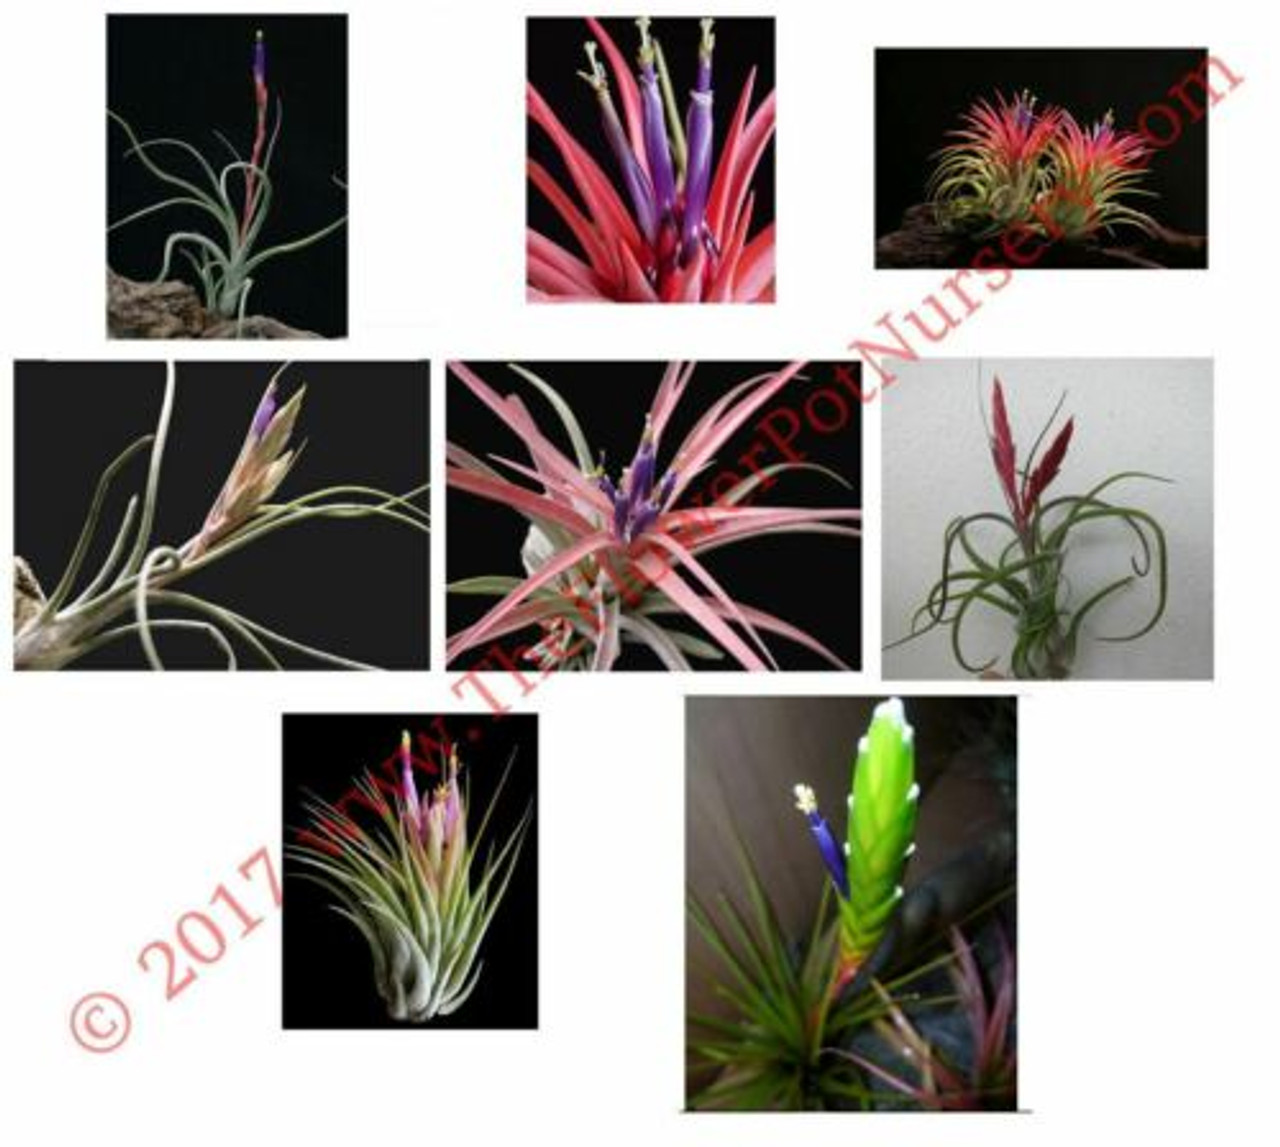 Lot Of 10 Air Plants Tillandsia Spp Medium Premium Assorted